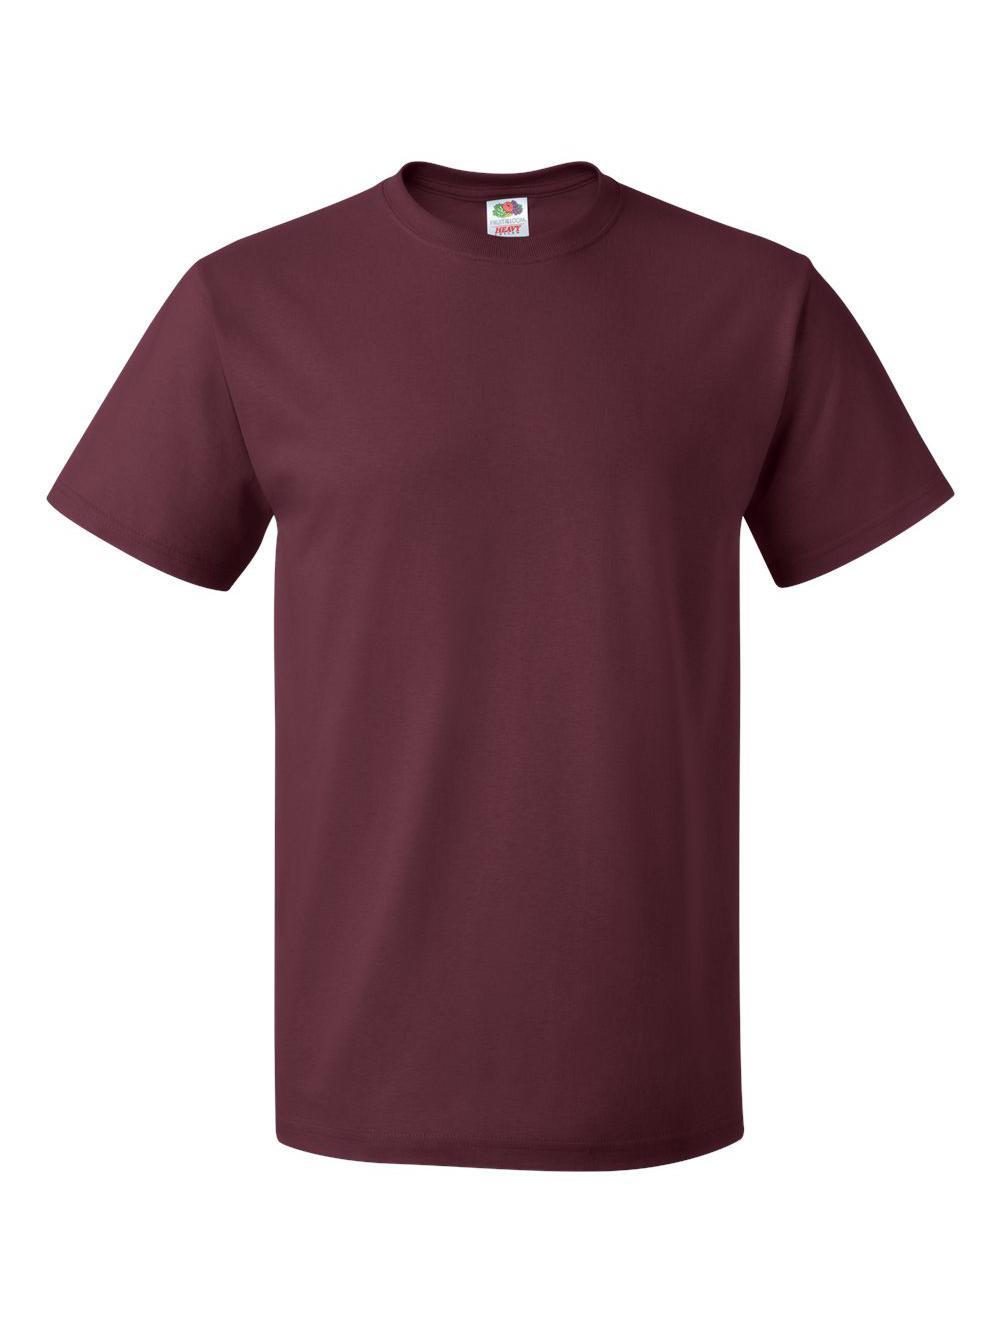 Fruit-of-the-Loom-HD-Cotton-Short-Sleeve-T-Shirt-3930R thumbnail 75